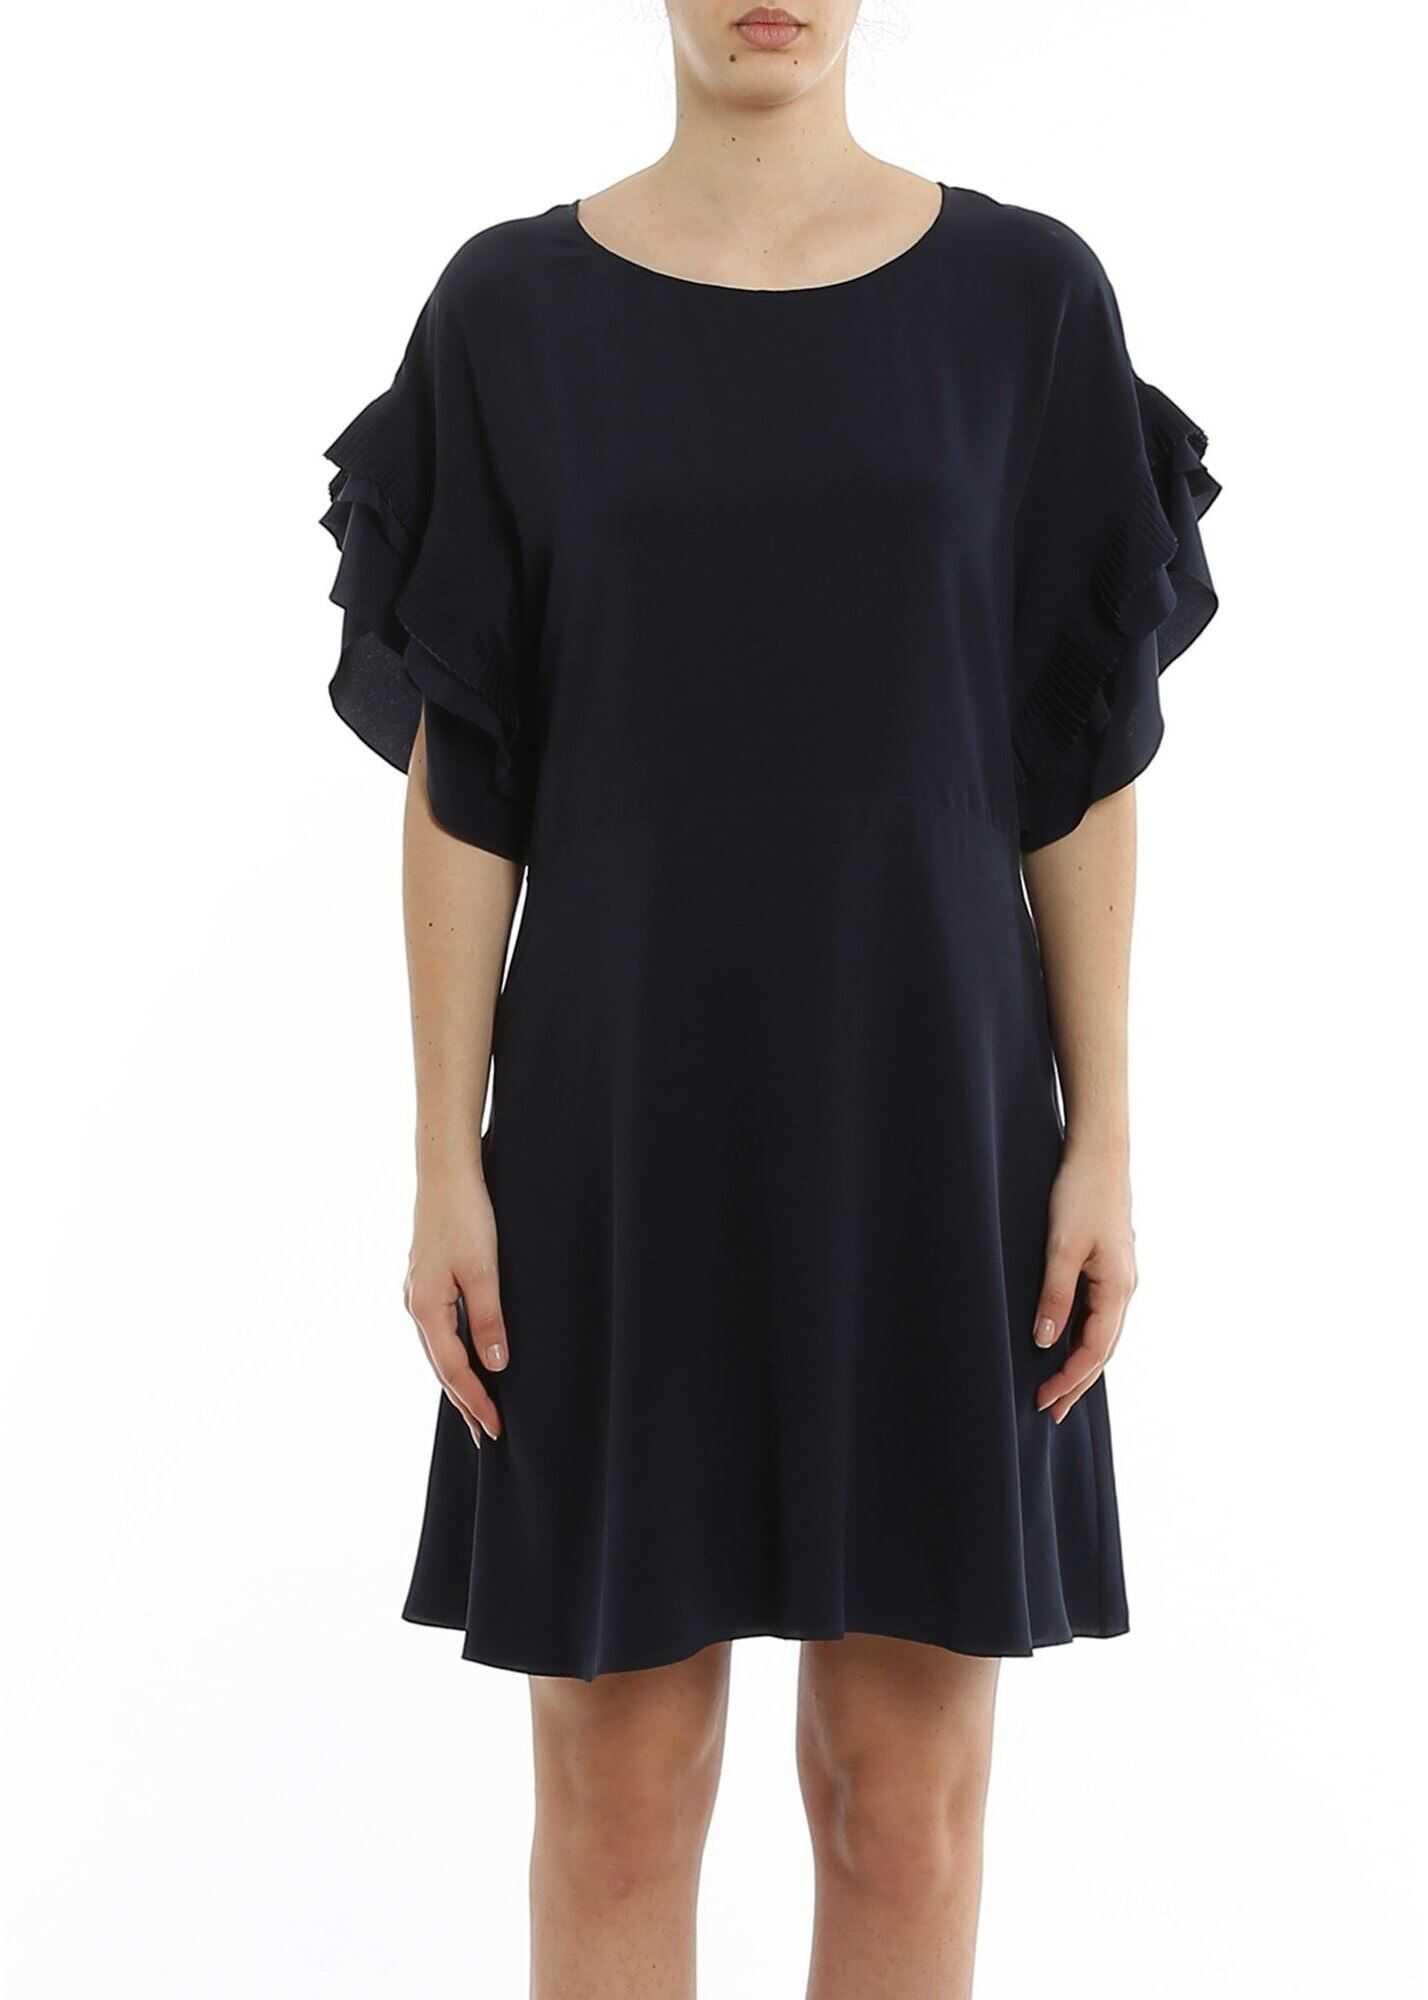 Chloe Silk Dress With Pleated Sleeves Blue